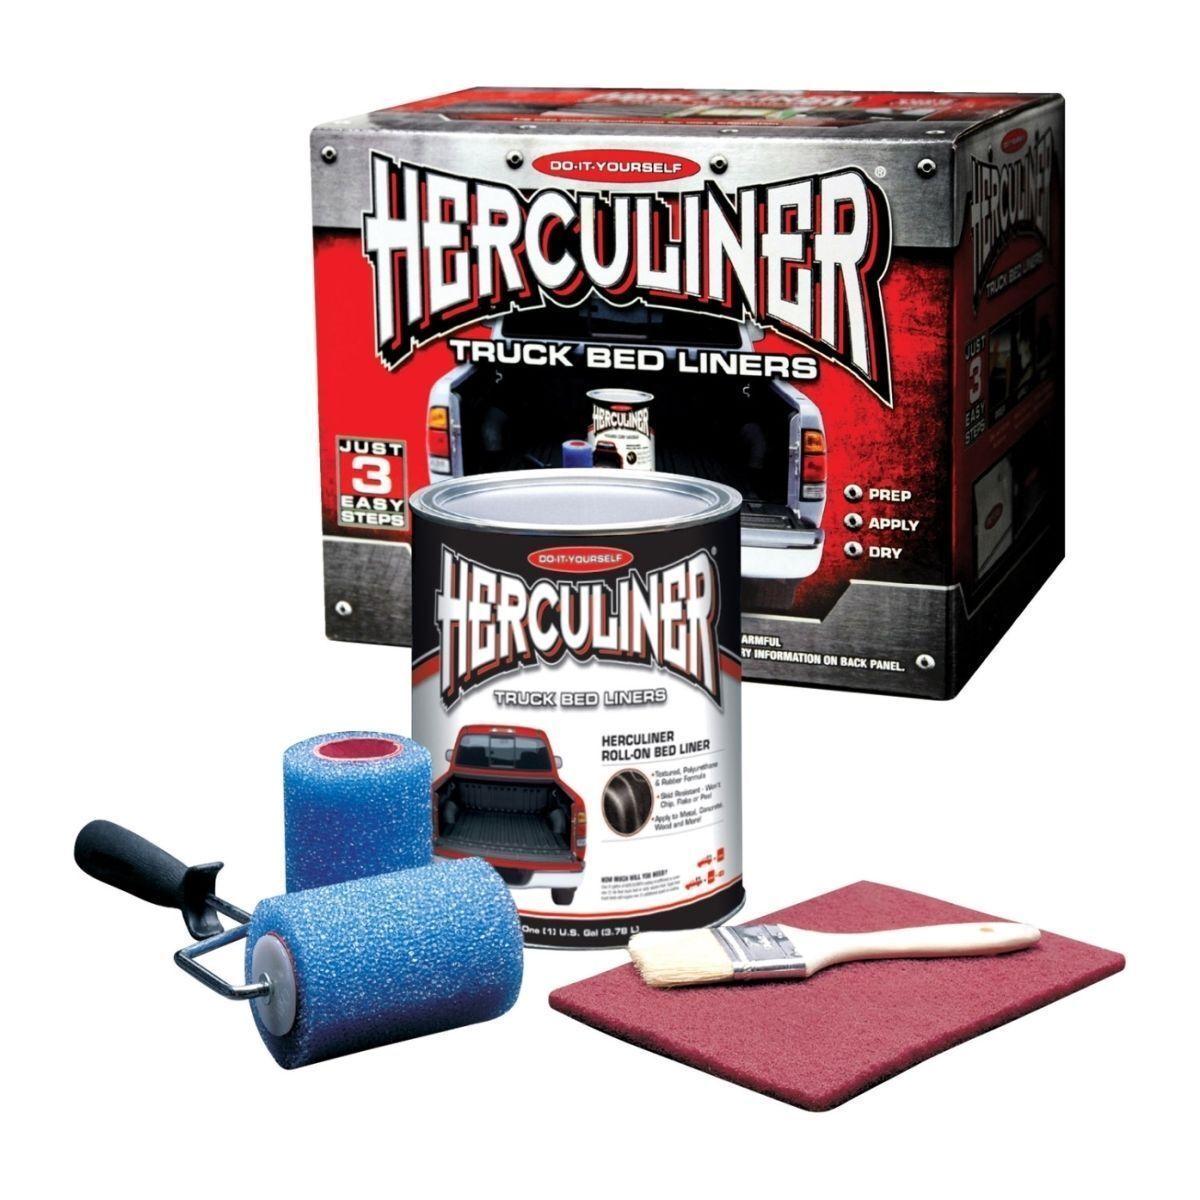 Herculiner hcl1b8 1 gallon truck brush on bedliner kit ebay resntentobalflowflowcomponenttechnicalissues solutioingenieria Gallery